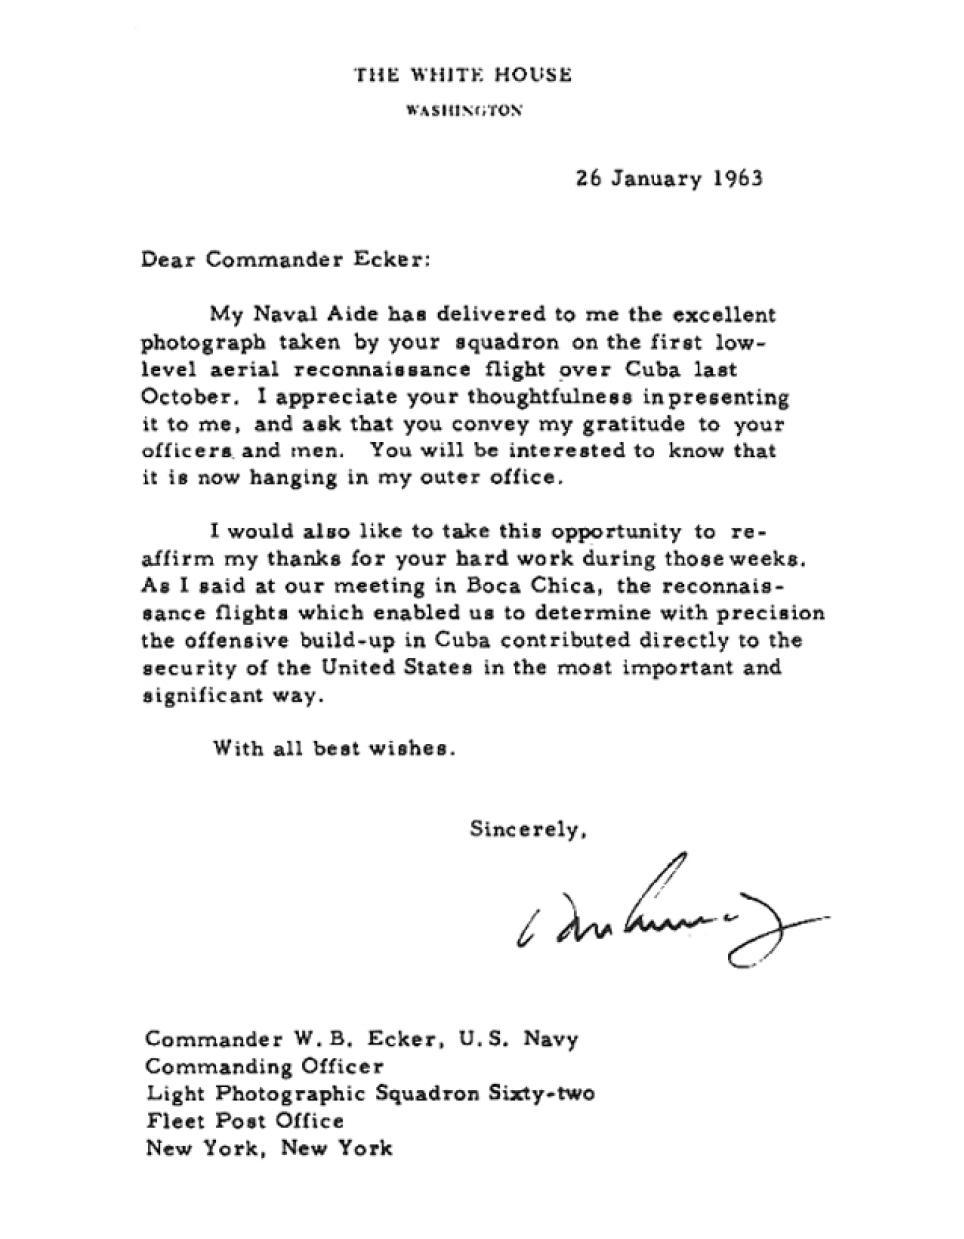 Army fleet support cover letter sarahepps navy designation letter spiritdancerdesigns Gallery